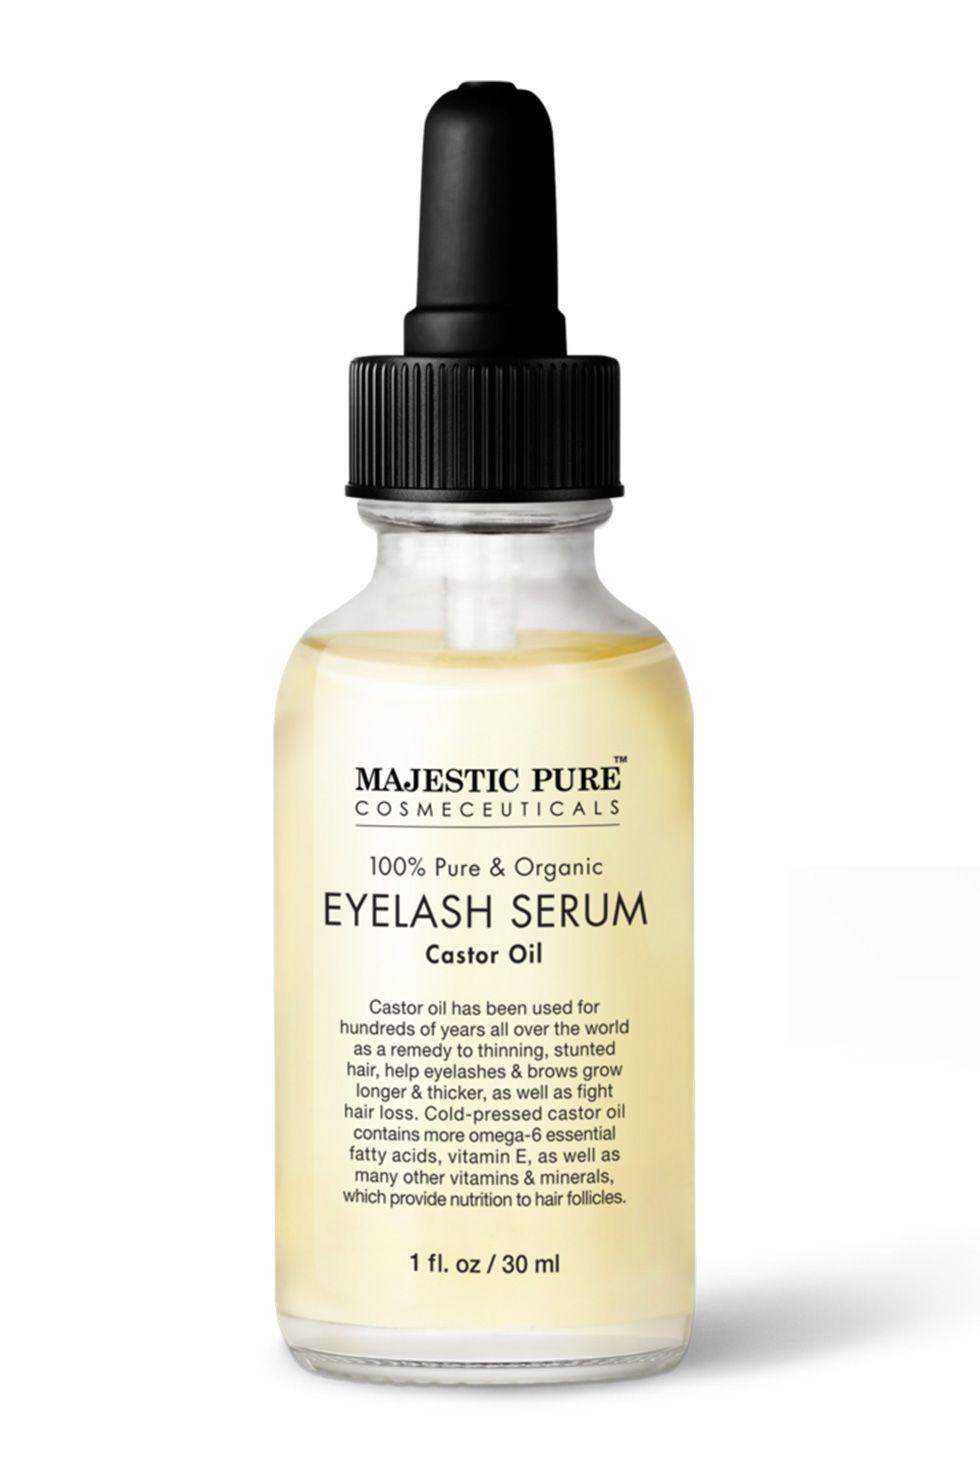 Majestic Pure 100 % Pure and Organic Eyelash Serum Castor Oil